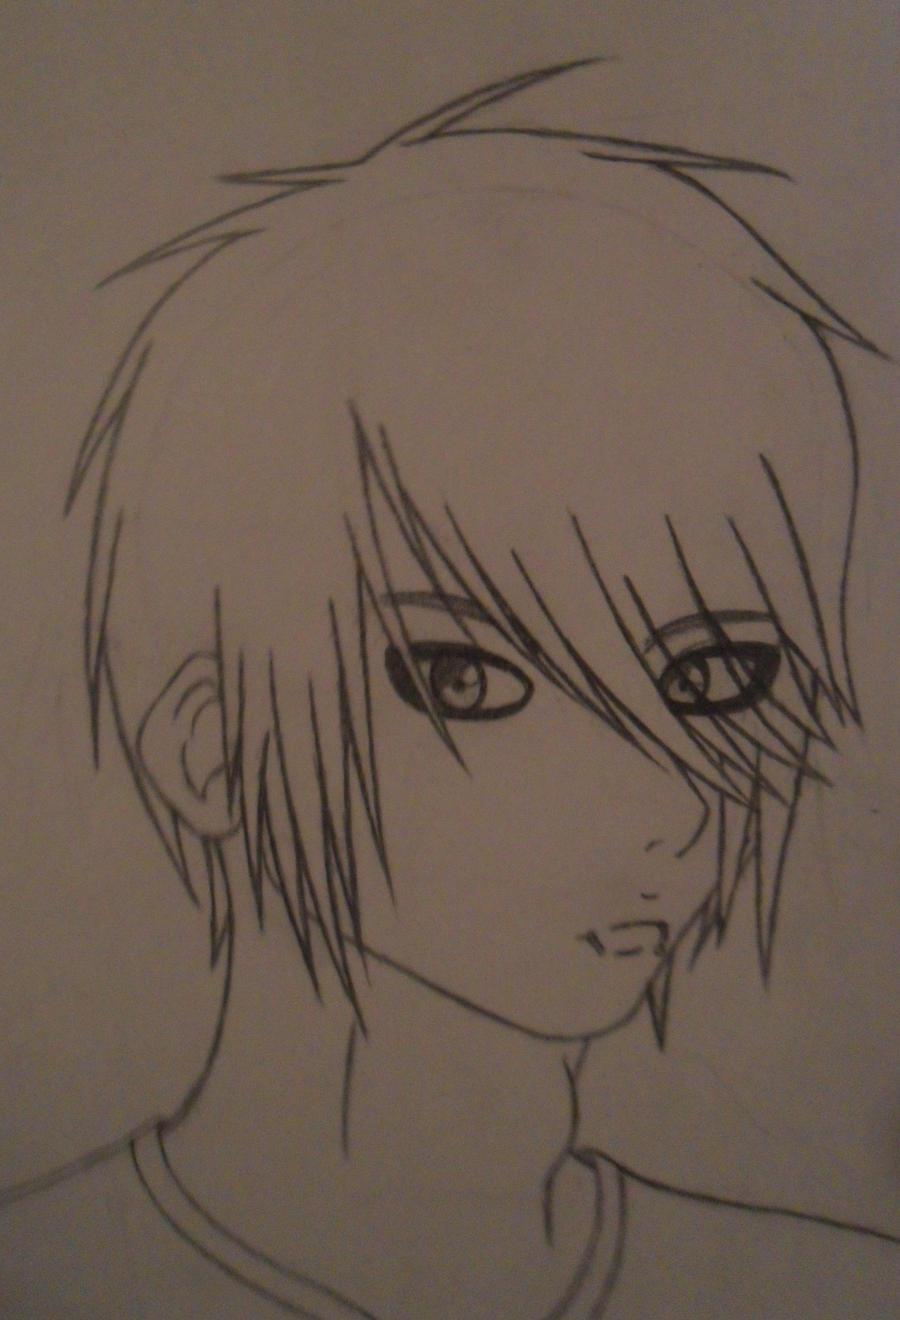 Emo boy drawing by amiaice on deviantart emo boy drawing by amiaice emo boy drawing by amiaice voltagebd Choice Image